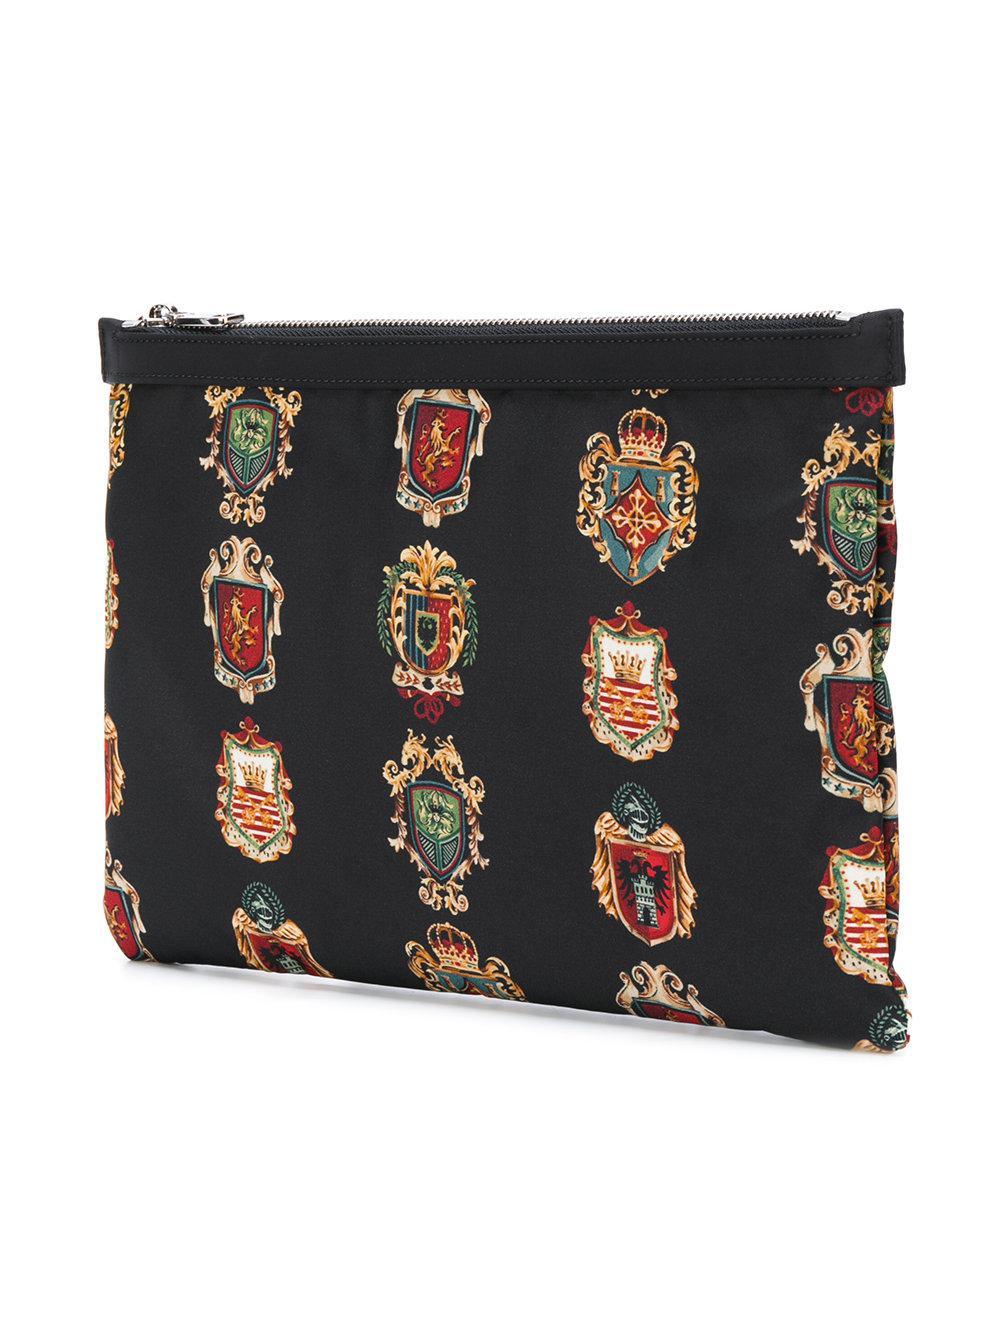 Crest print document holder Dolce & Gabbana nzTSbBJ